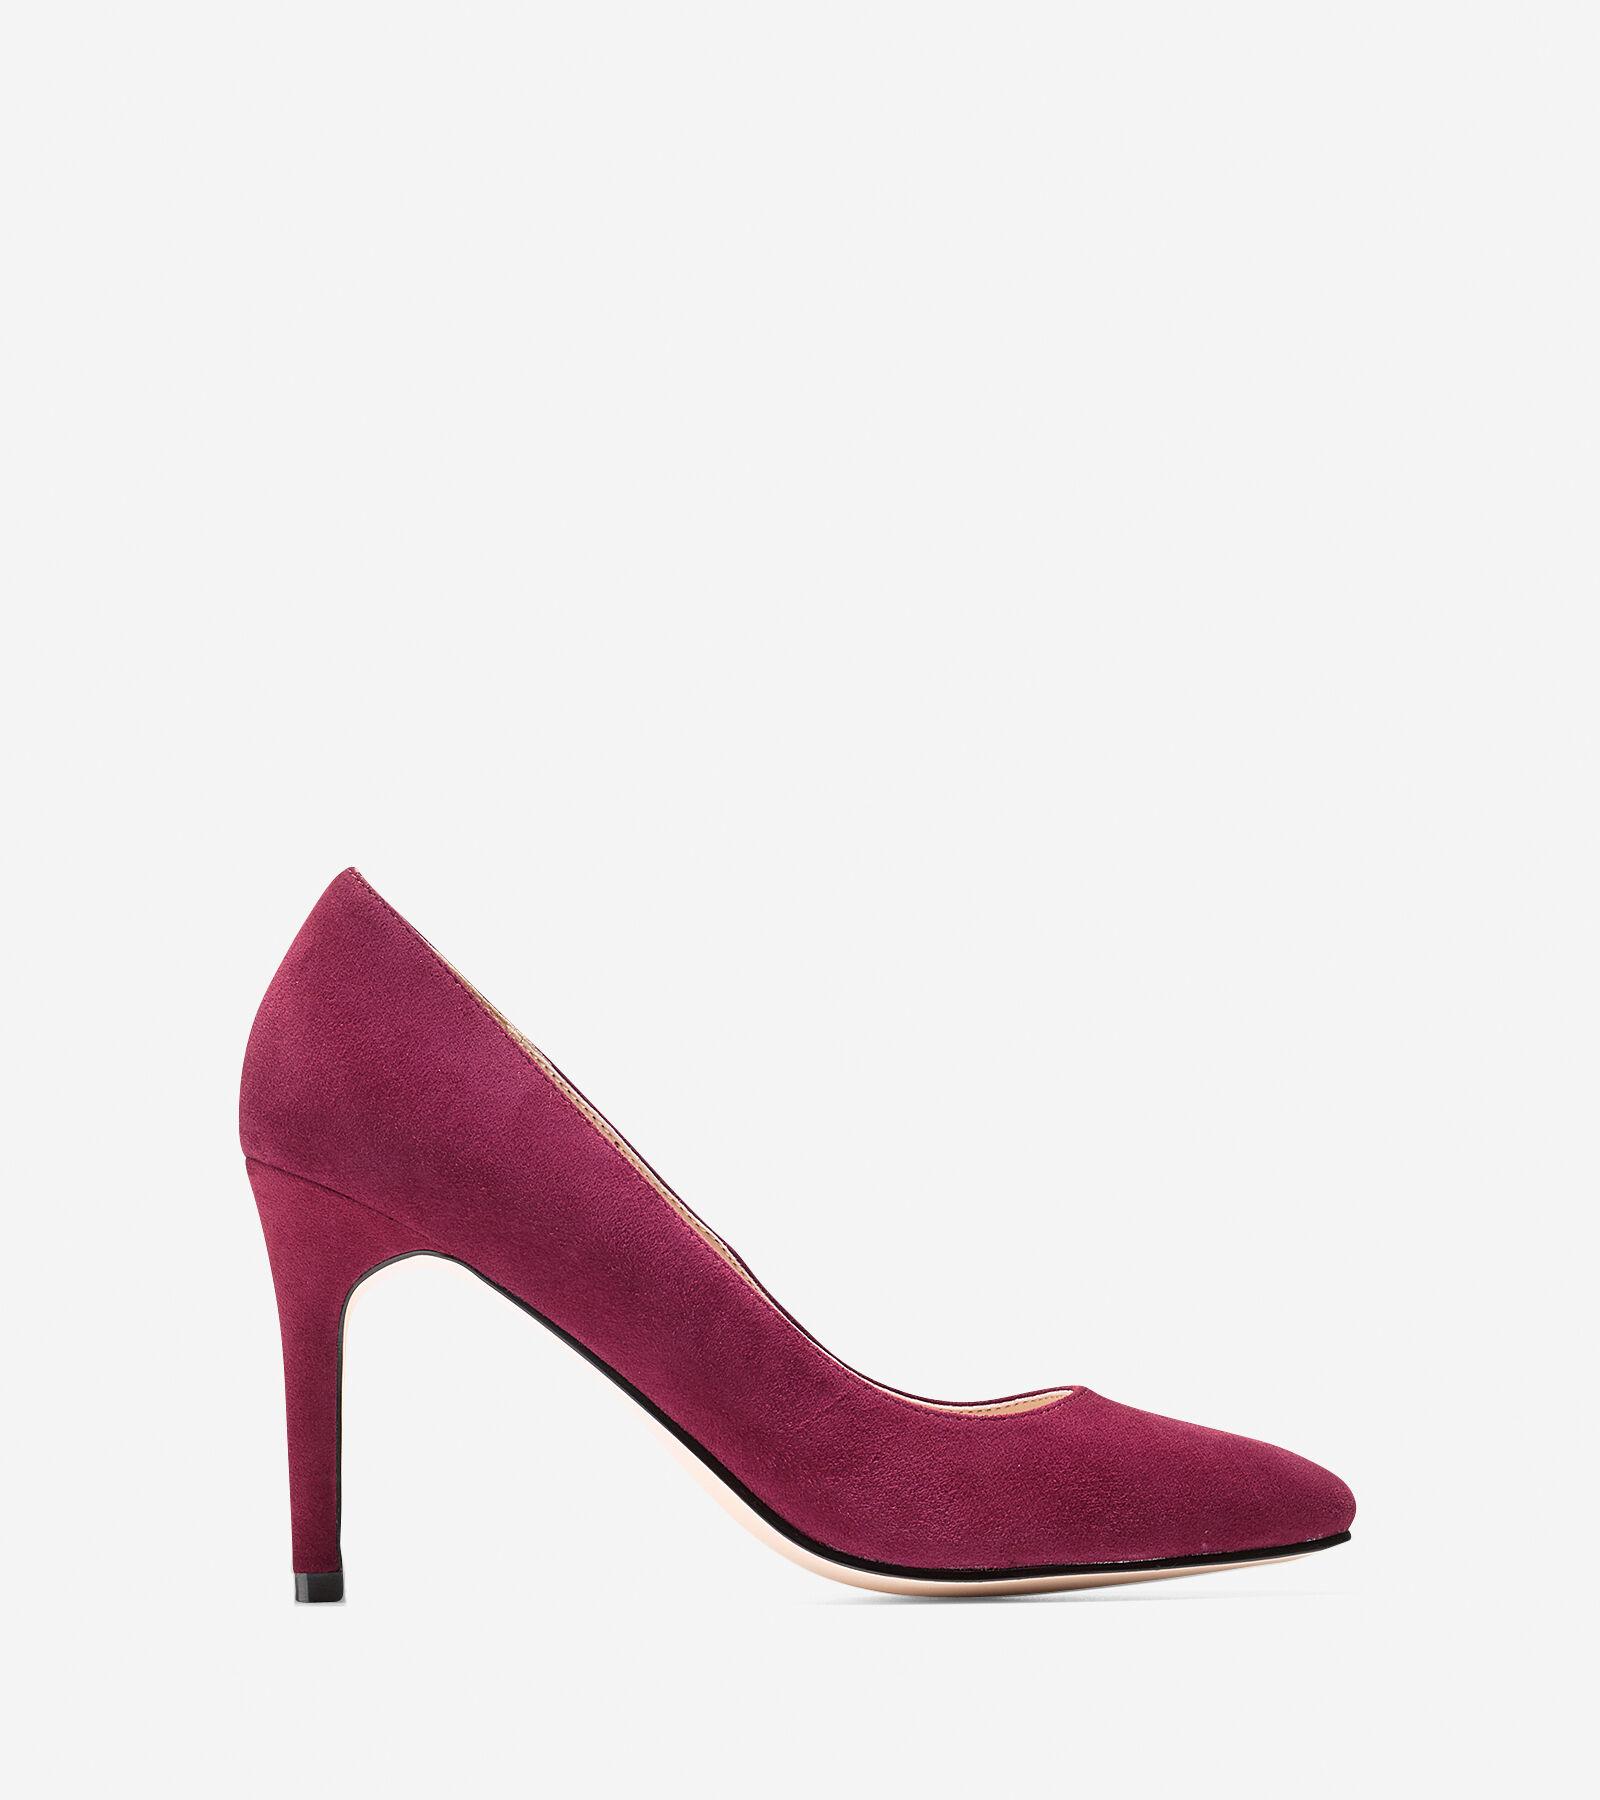 Womens Shoes Cole Haan Fair Haven Pump Zinfandel Suede